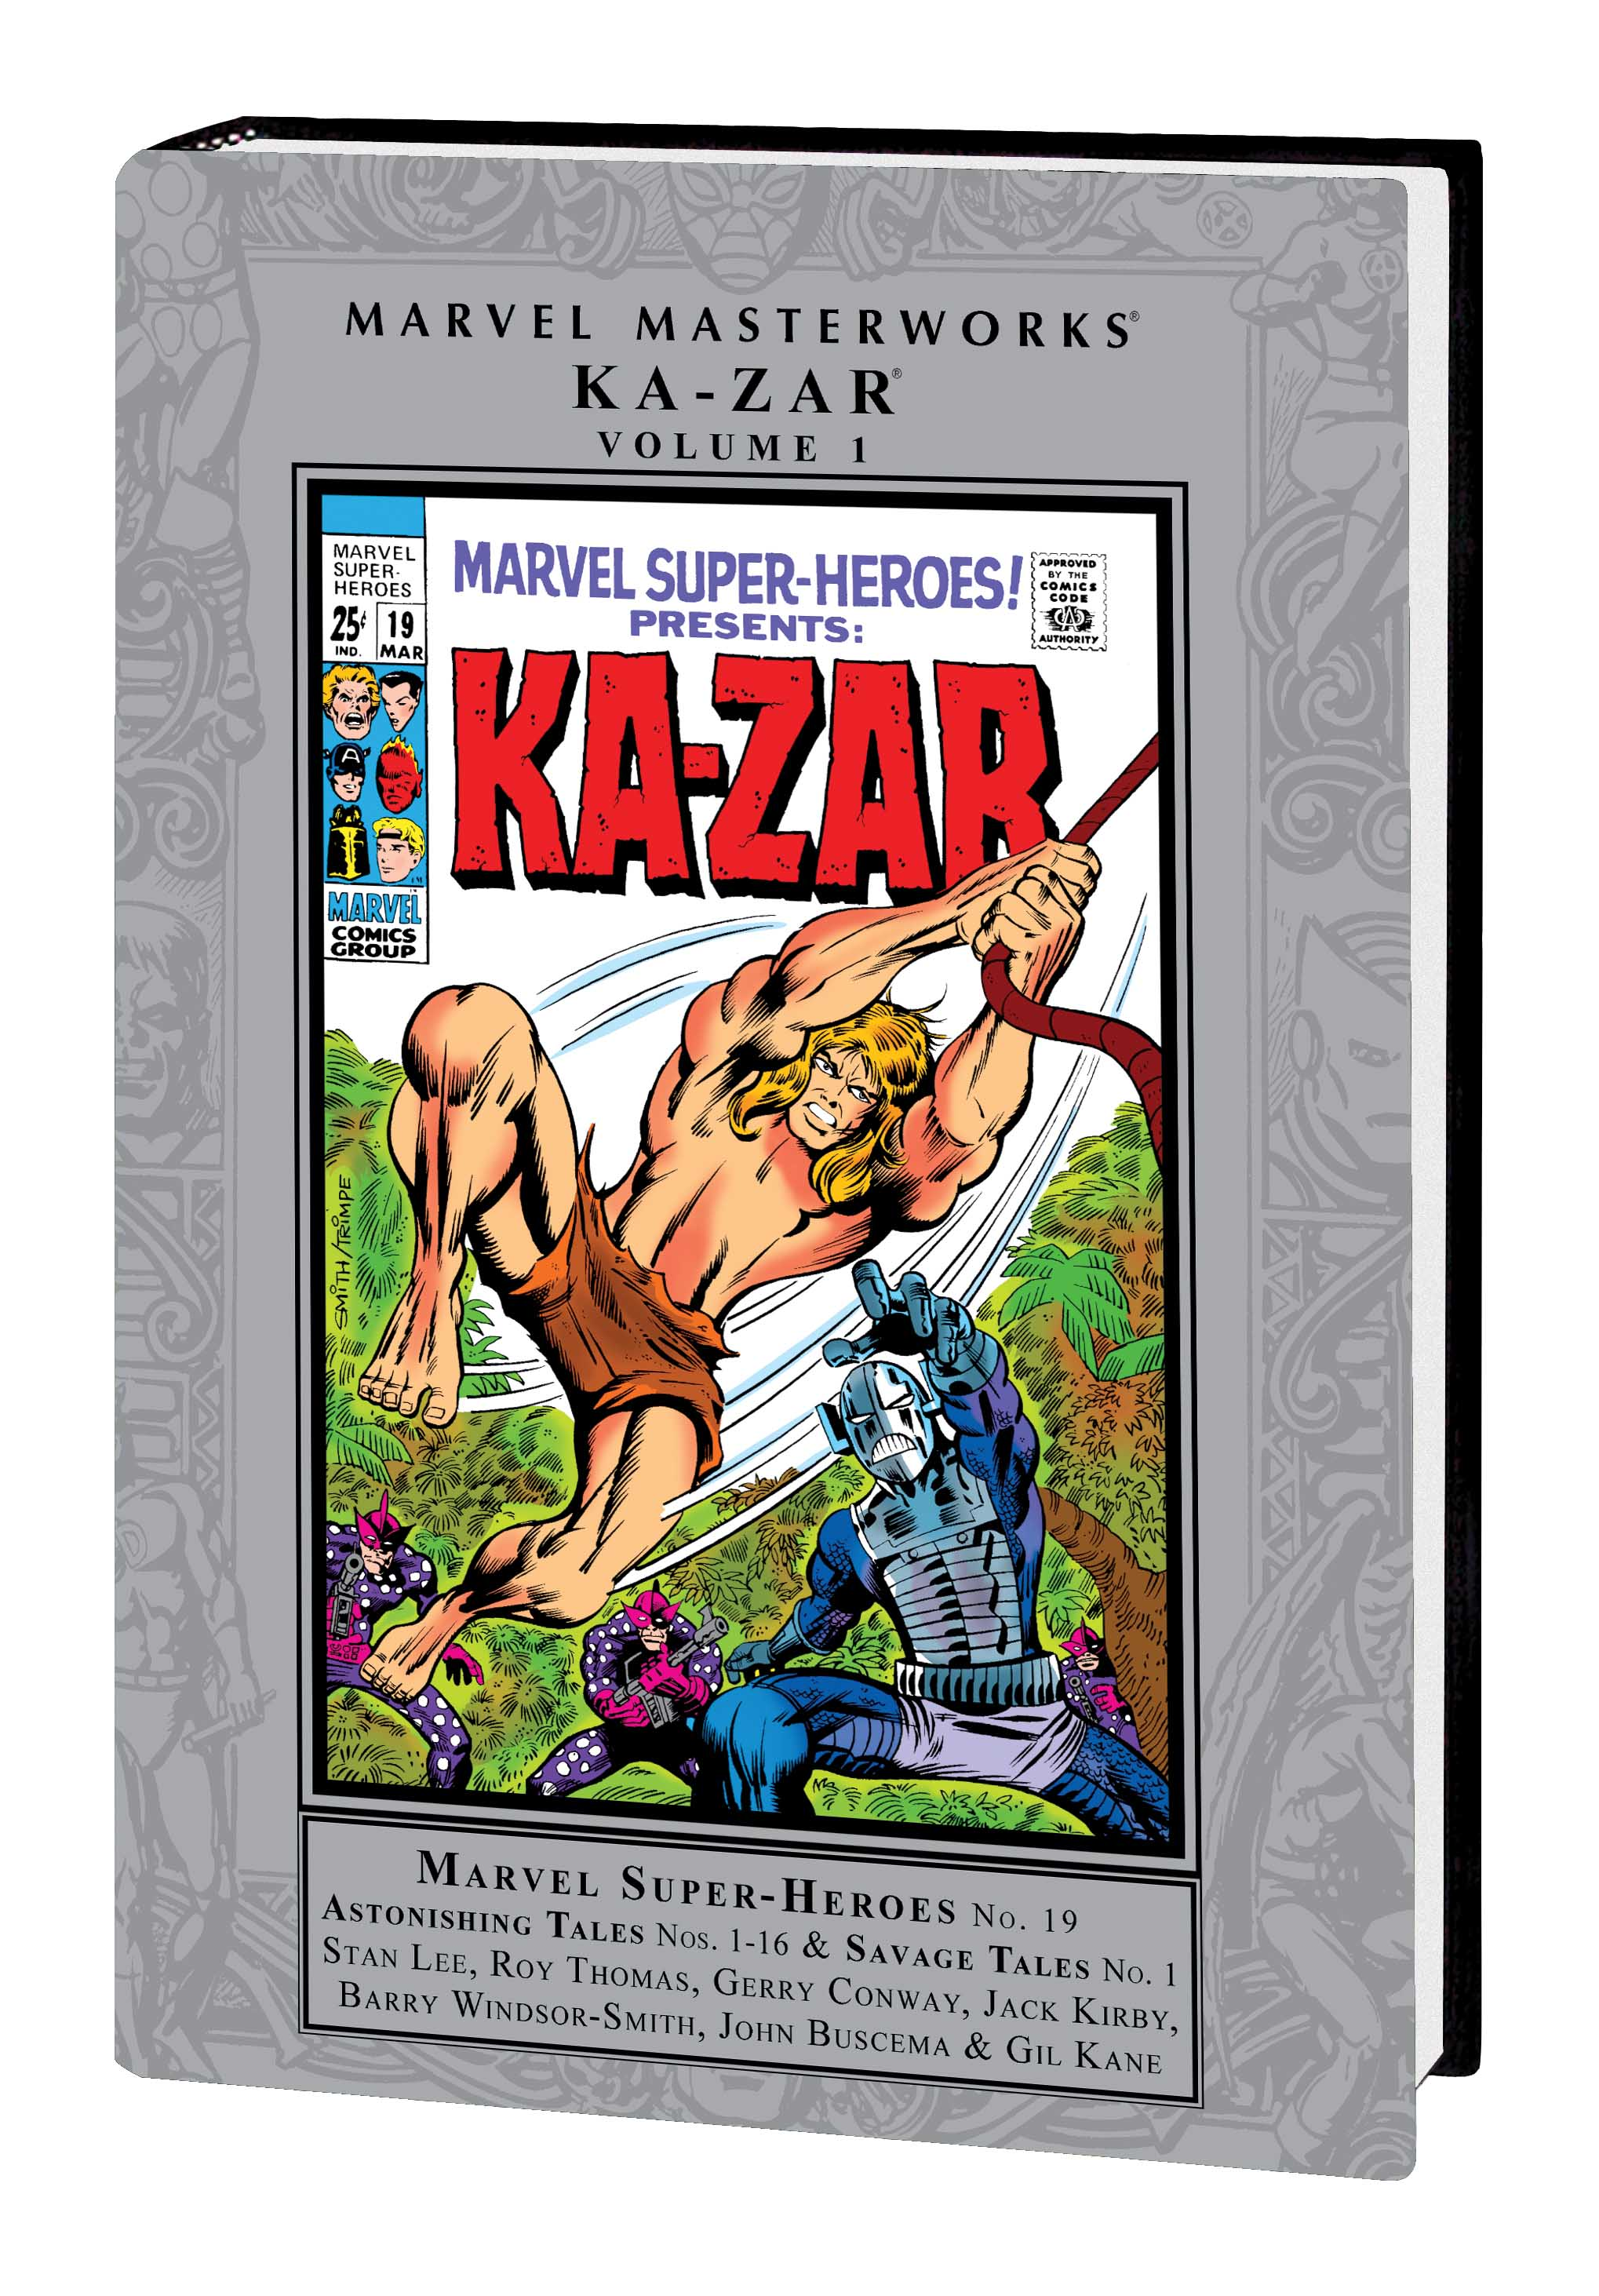 MARVEL MASTERWORKS: KA-ZAR VOL. 1 HC (Hardcover)